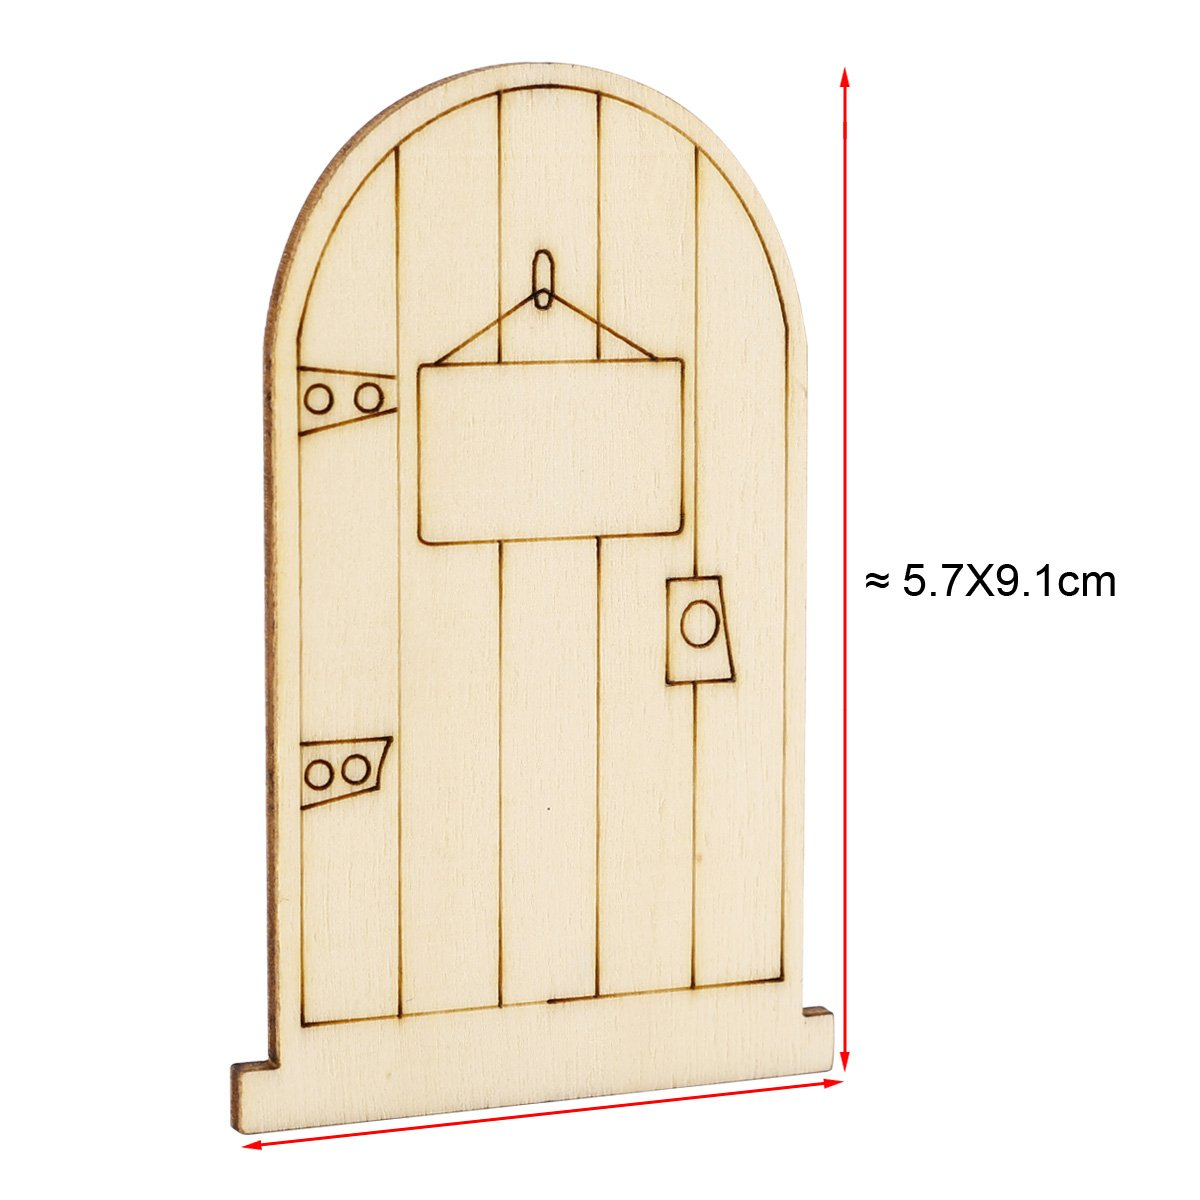 NEW 25Pcs Laser Cut Wooden Fairy Doors Unpainted with Plaque DIY Craft